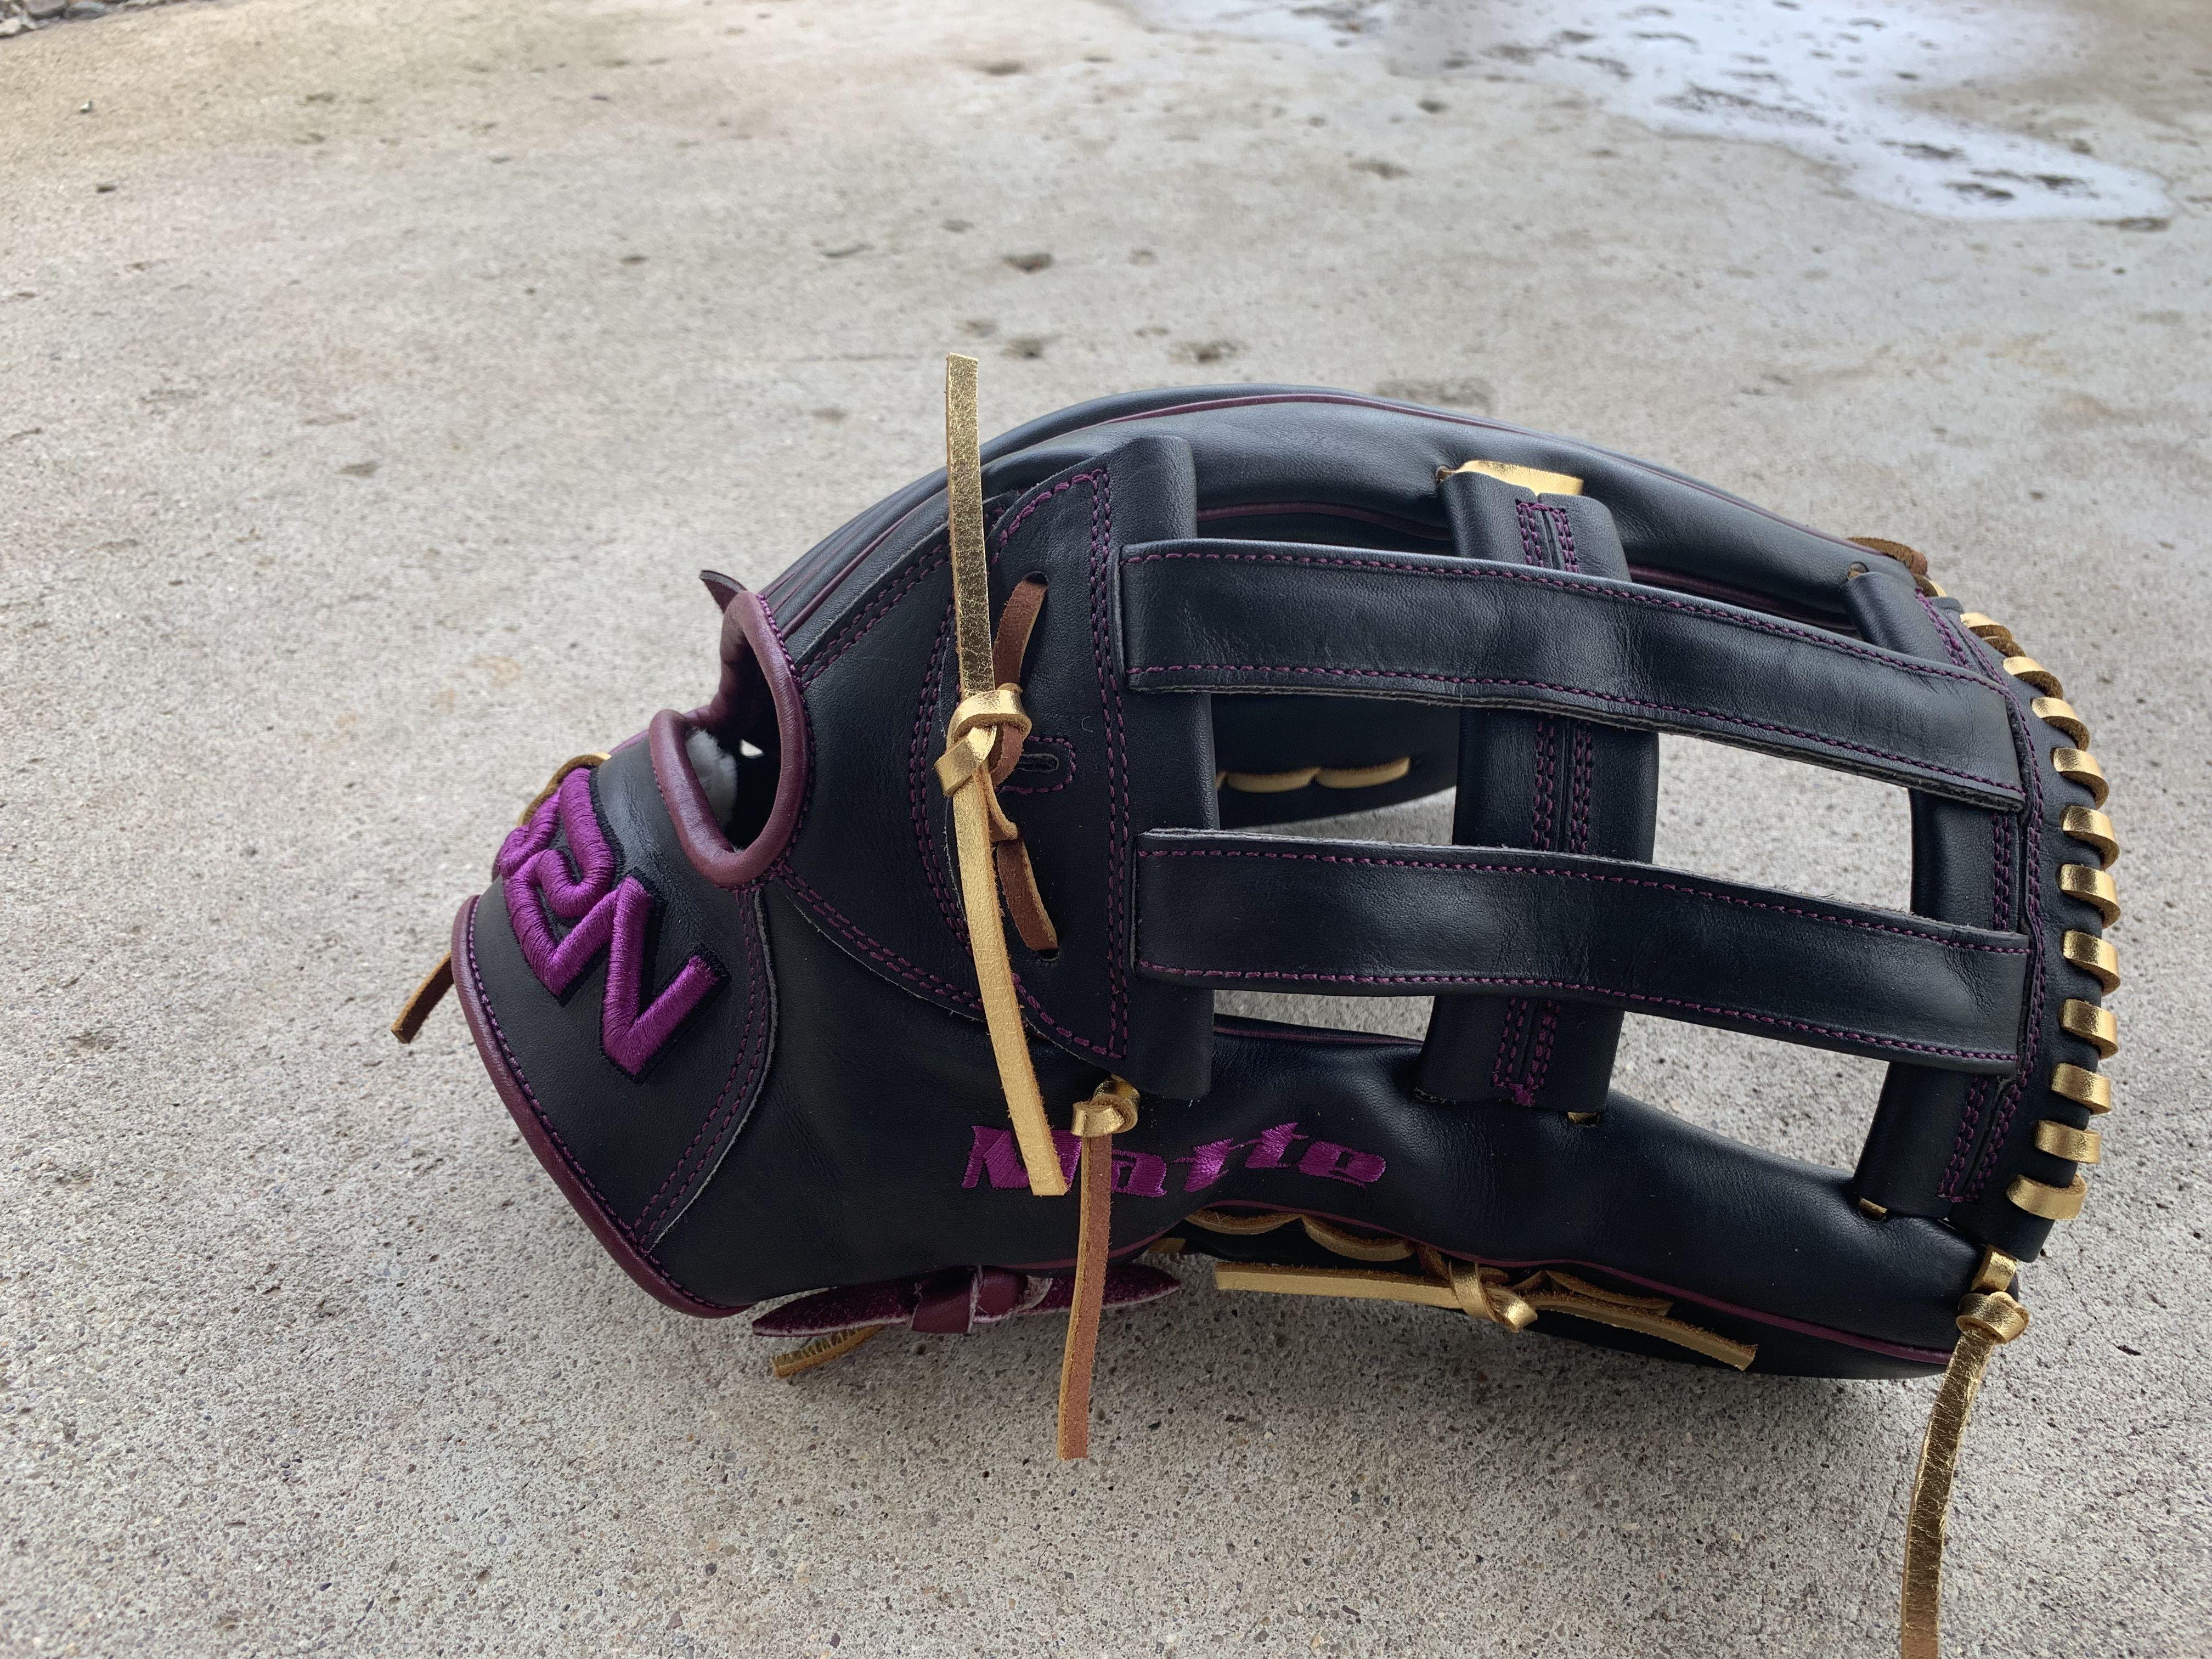 Phil Matte S2n Glove Bucket Bag Gloves Duffle